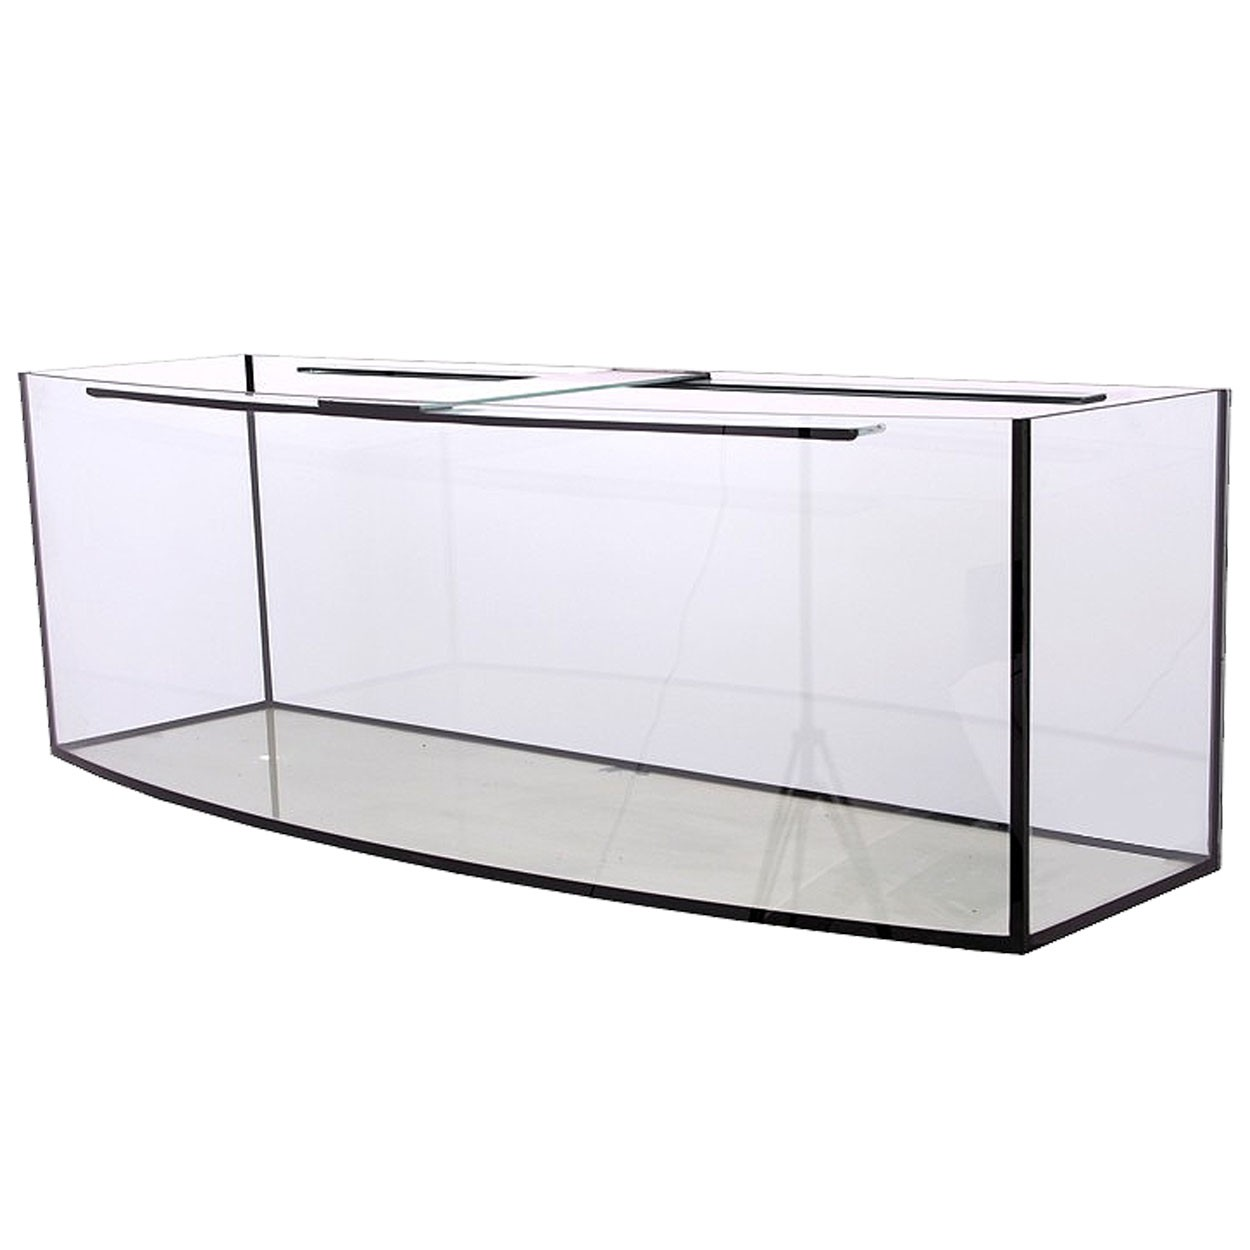 Aquarium glas becken 200x60x70 cm gew lbt 750 liter for Aquarium deckel 60x30